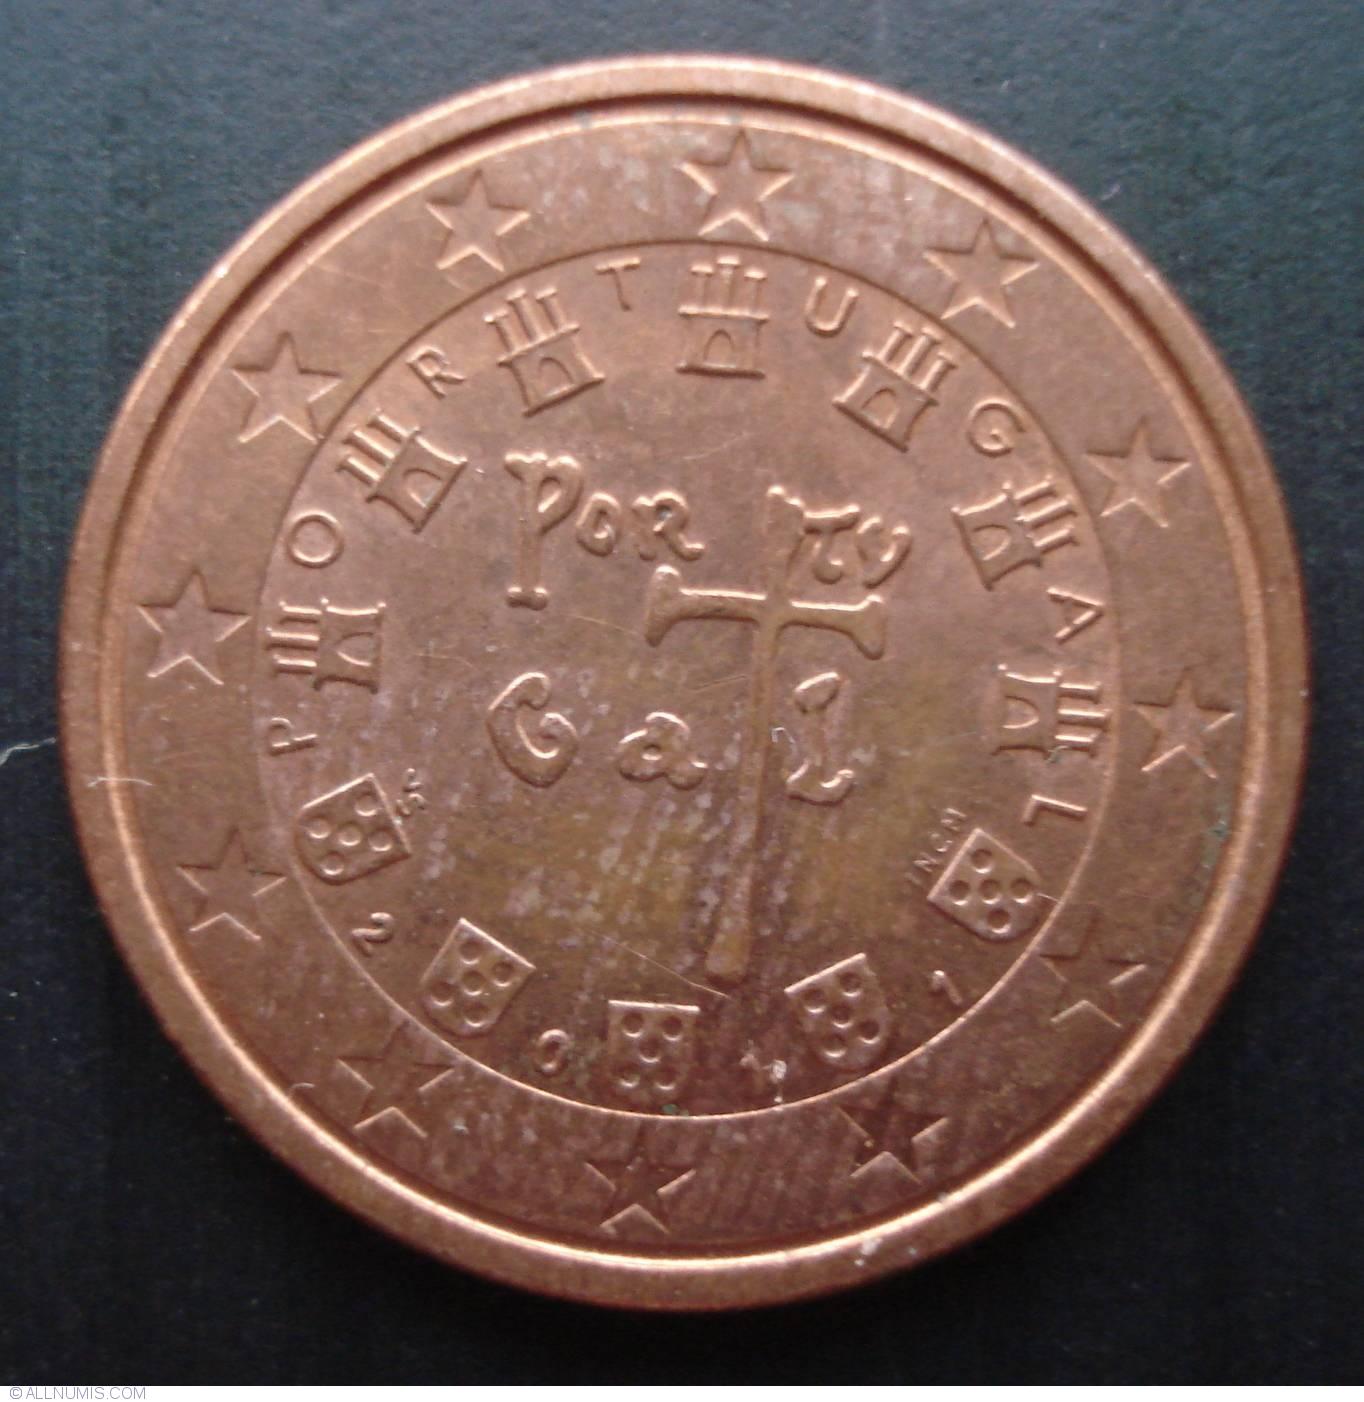 English To Italian Translator Google: 5 Euro Cent 2011, EURO (2002-present)